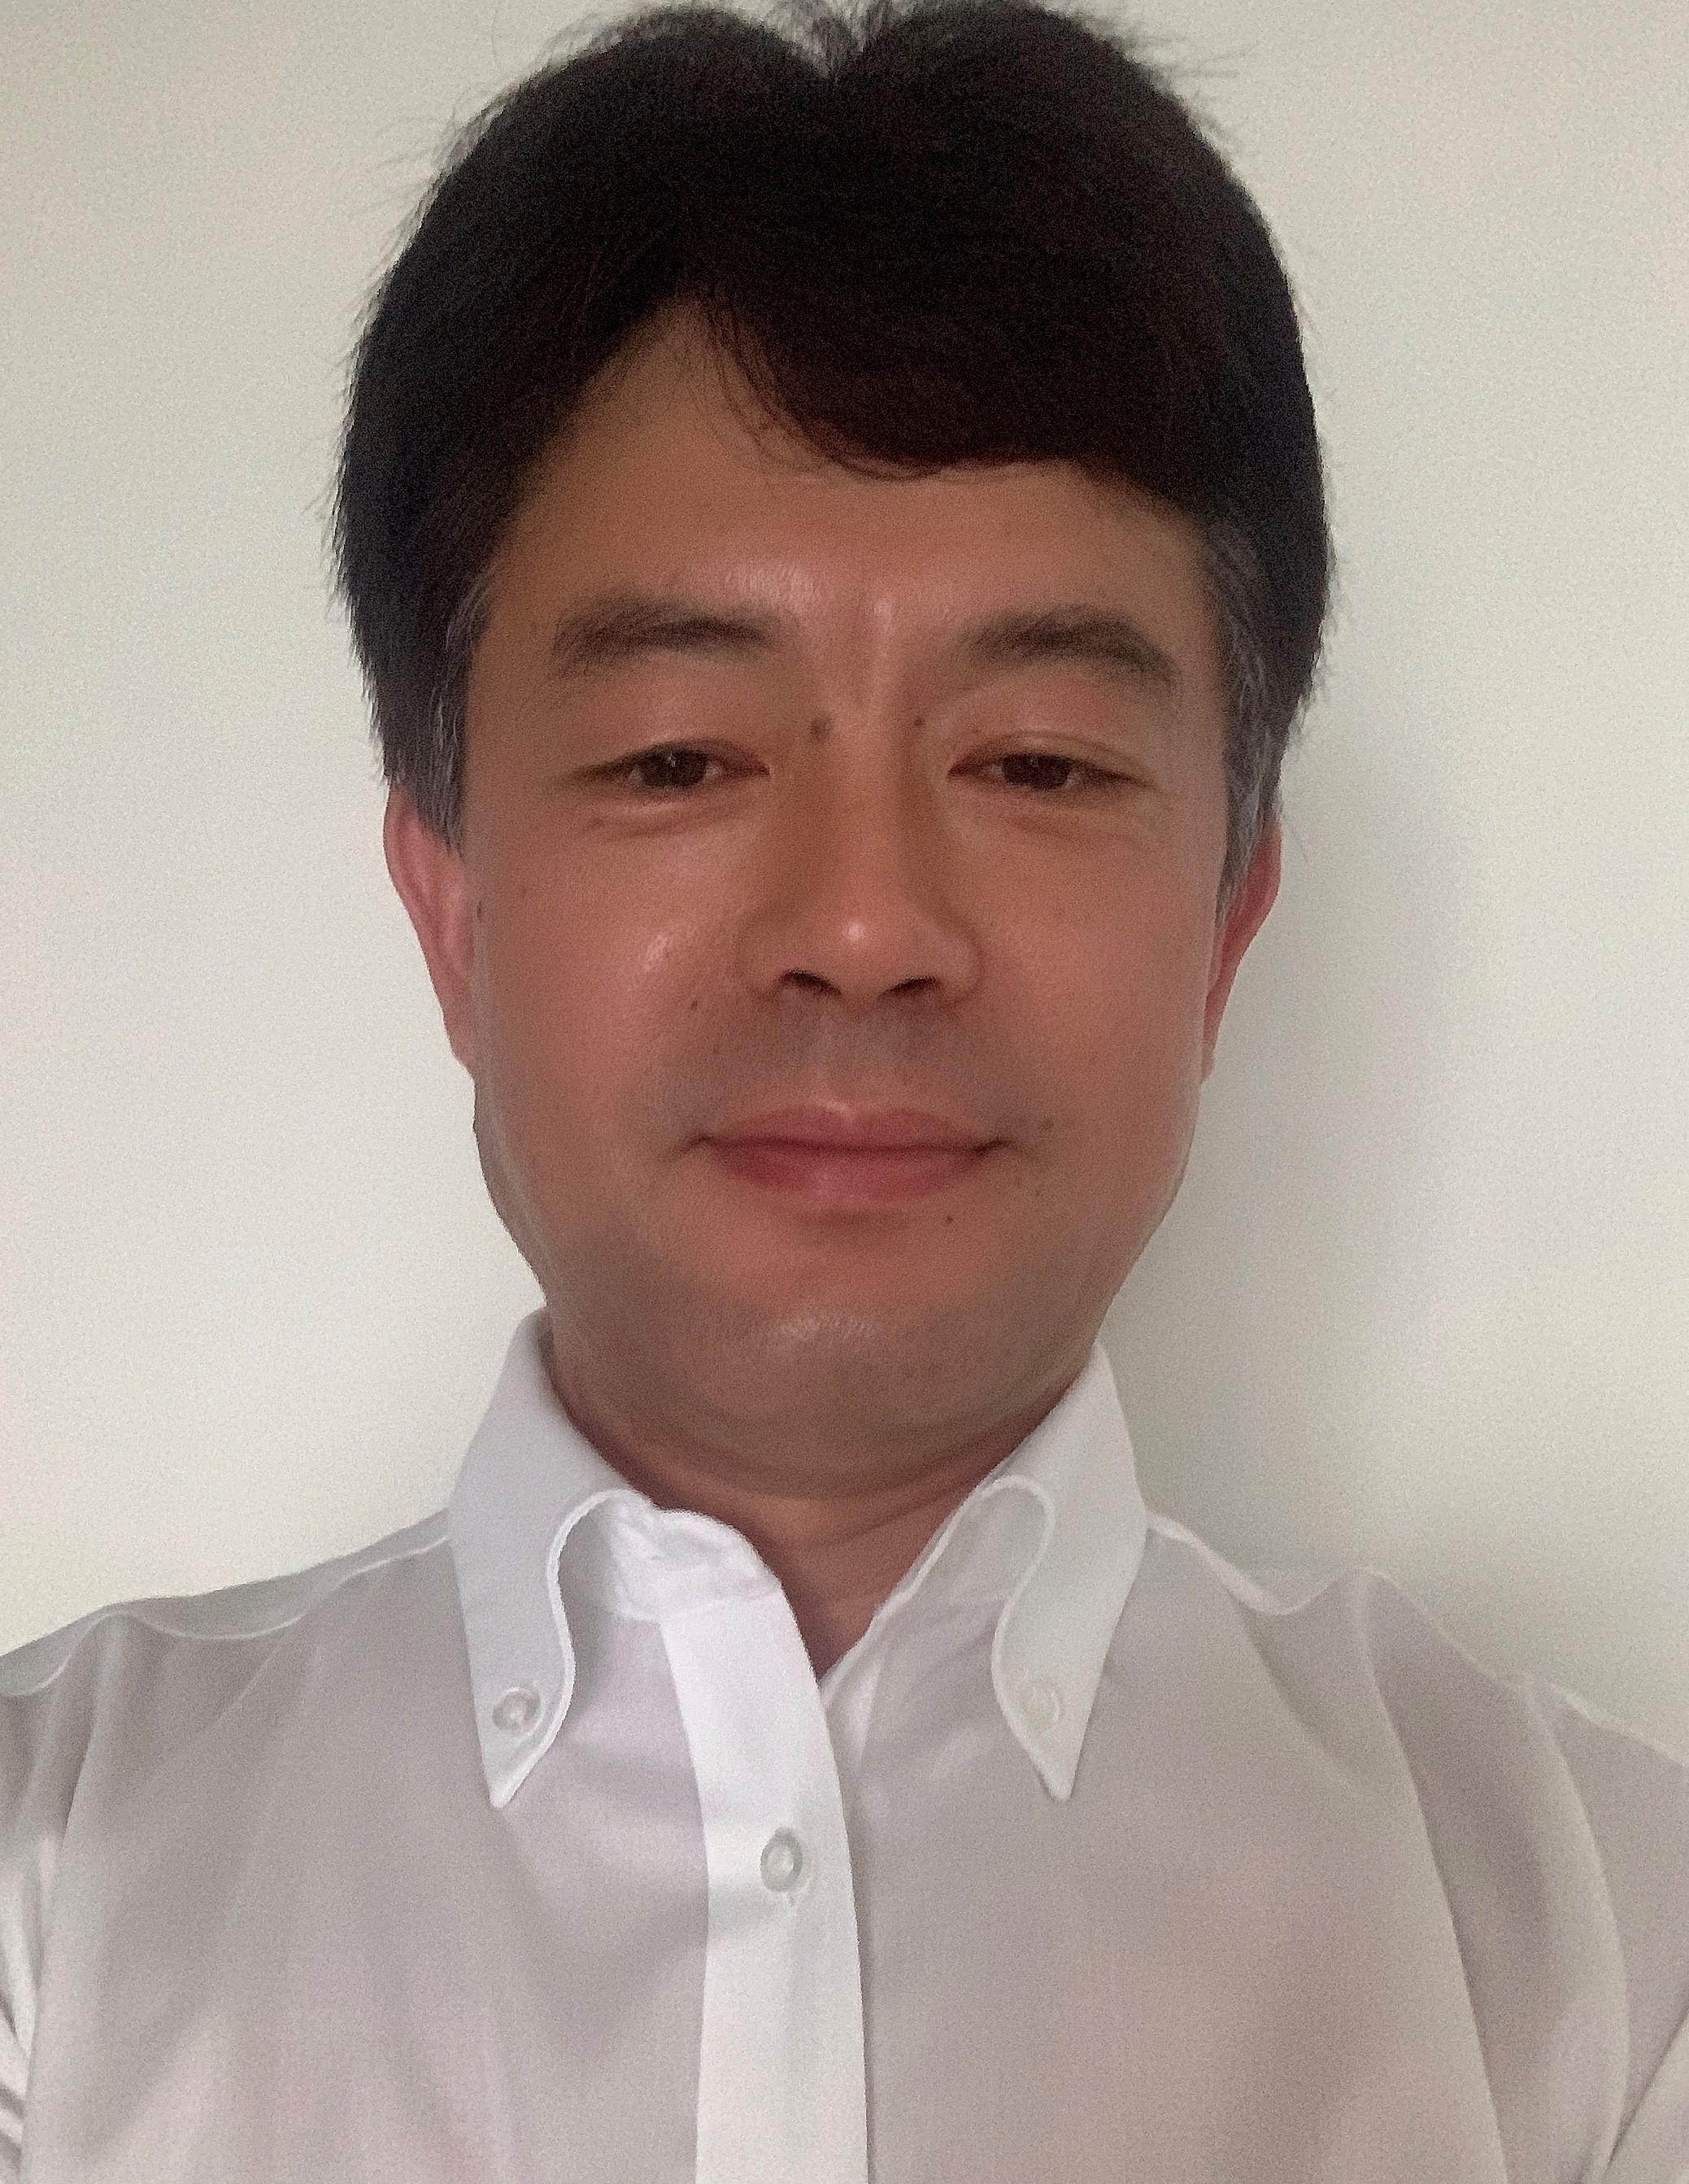 Zhang Guoping - 张国平 / 中国服务经理电子邮件:daniel.zhang@atlasconverting.com